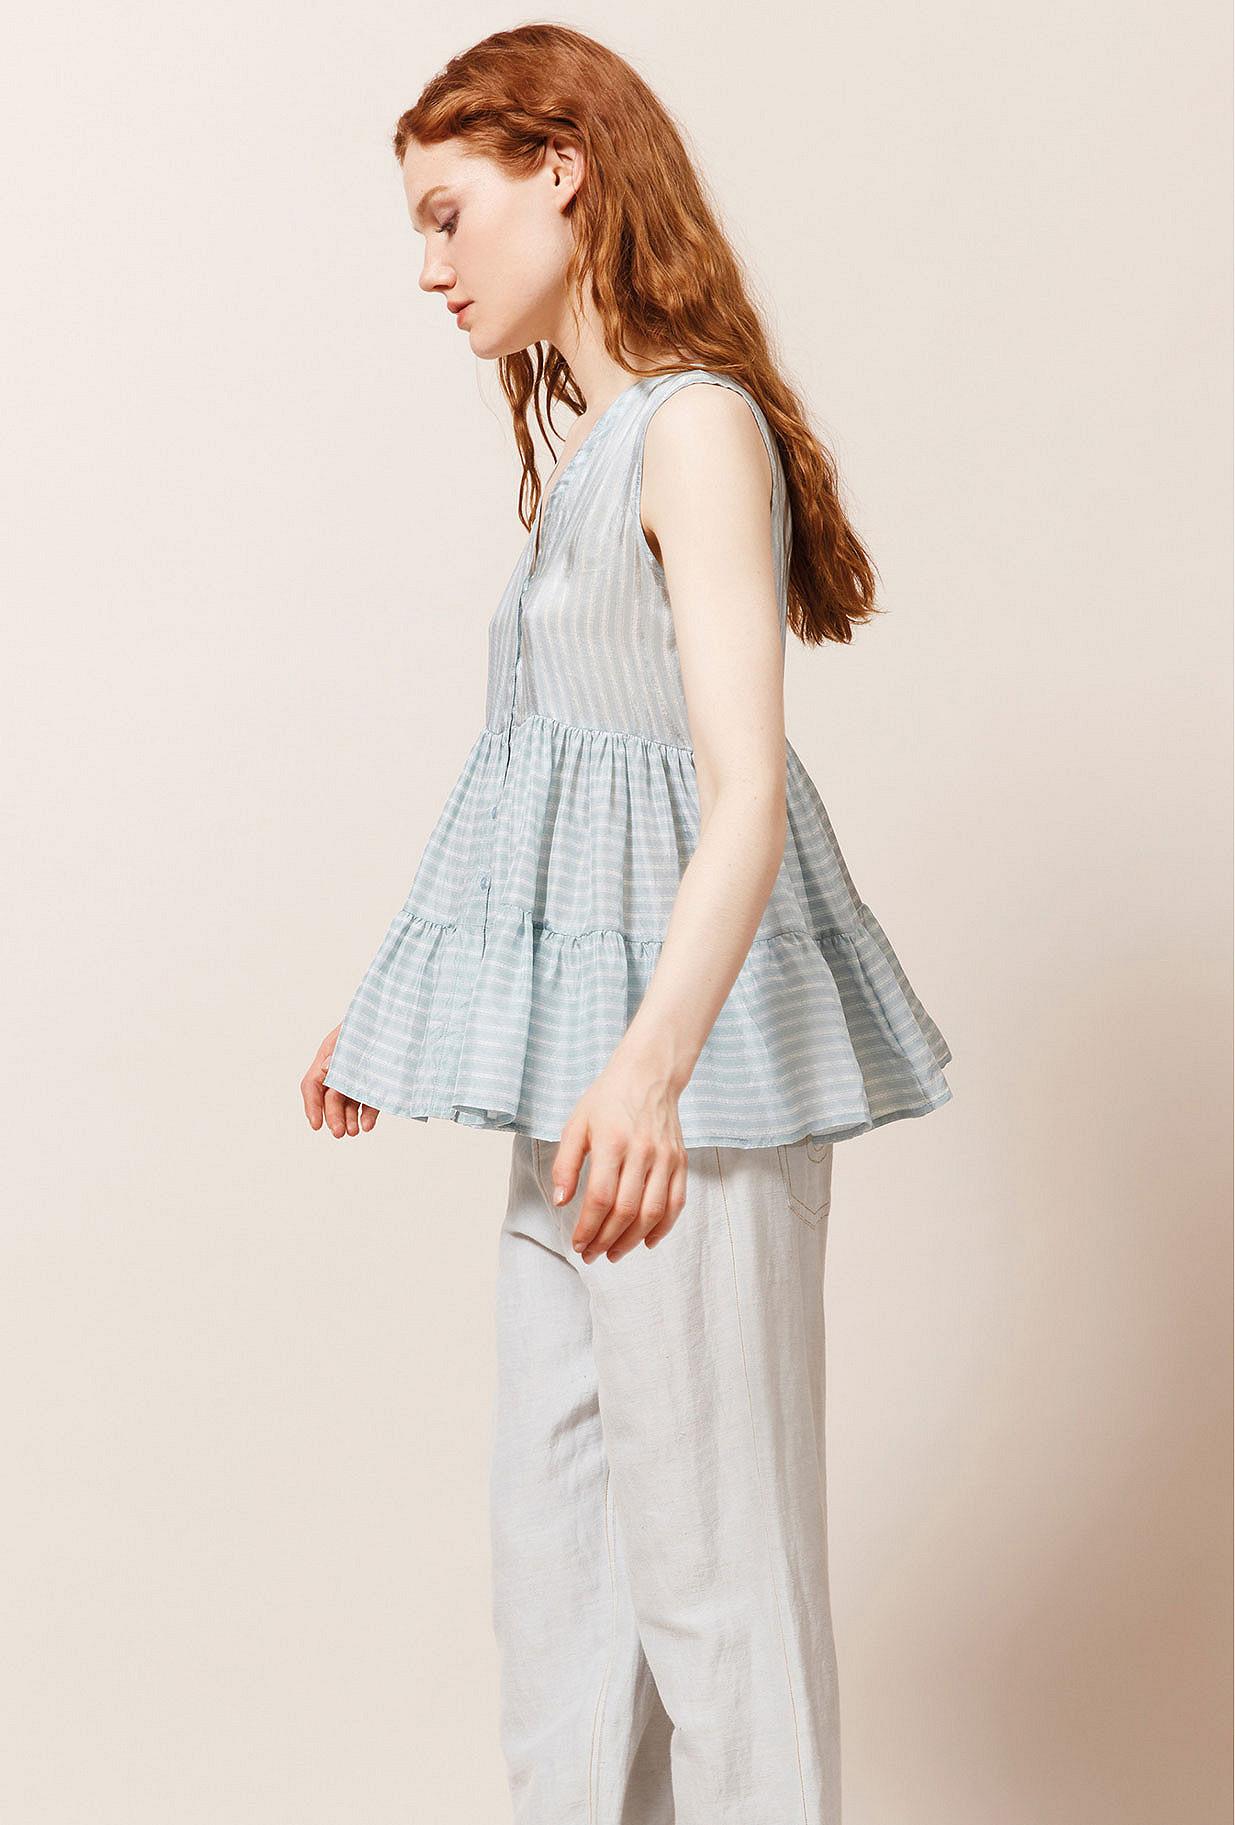 Paris clothes store Top  Jodha french designer fashion Paris